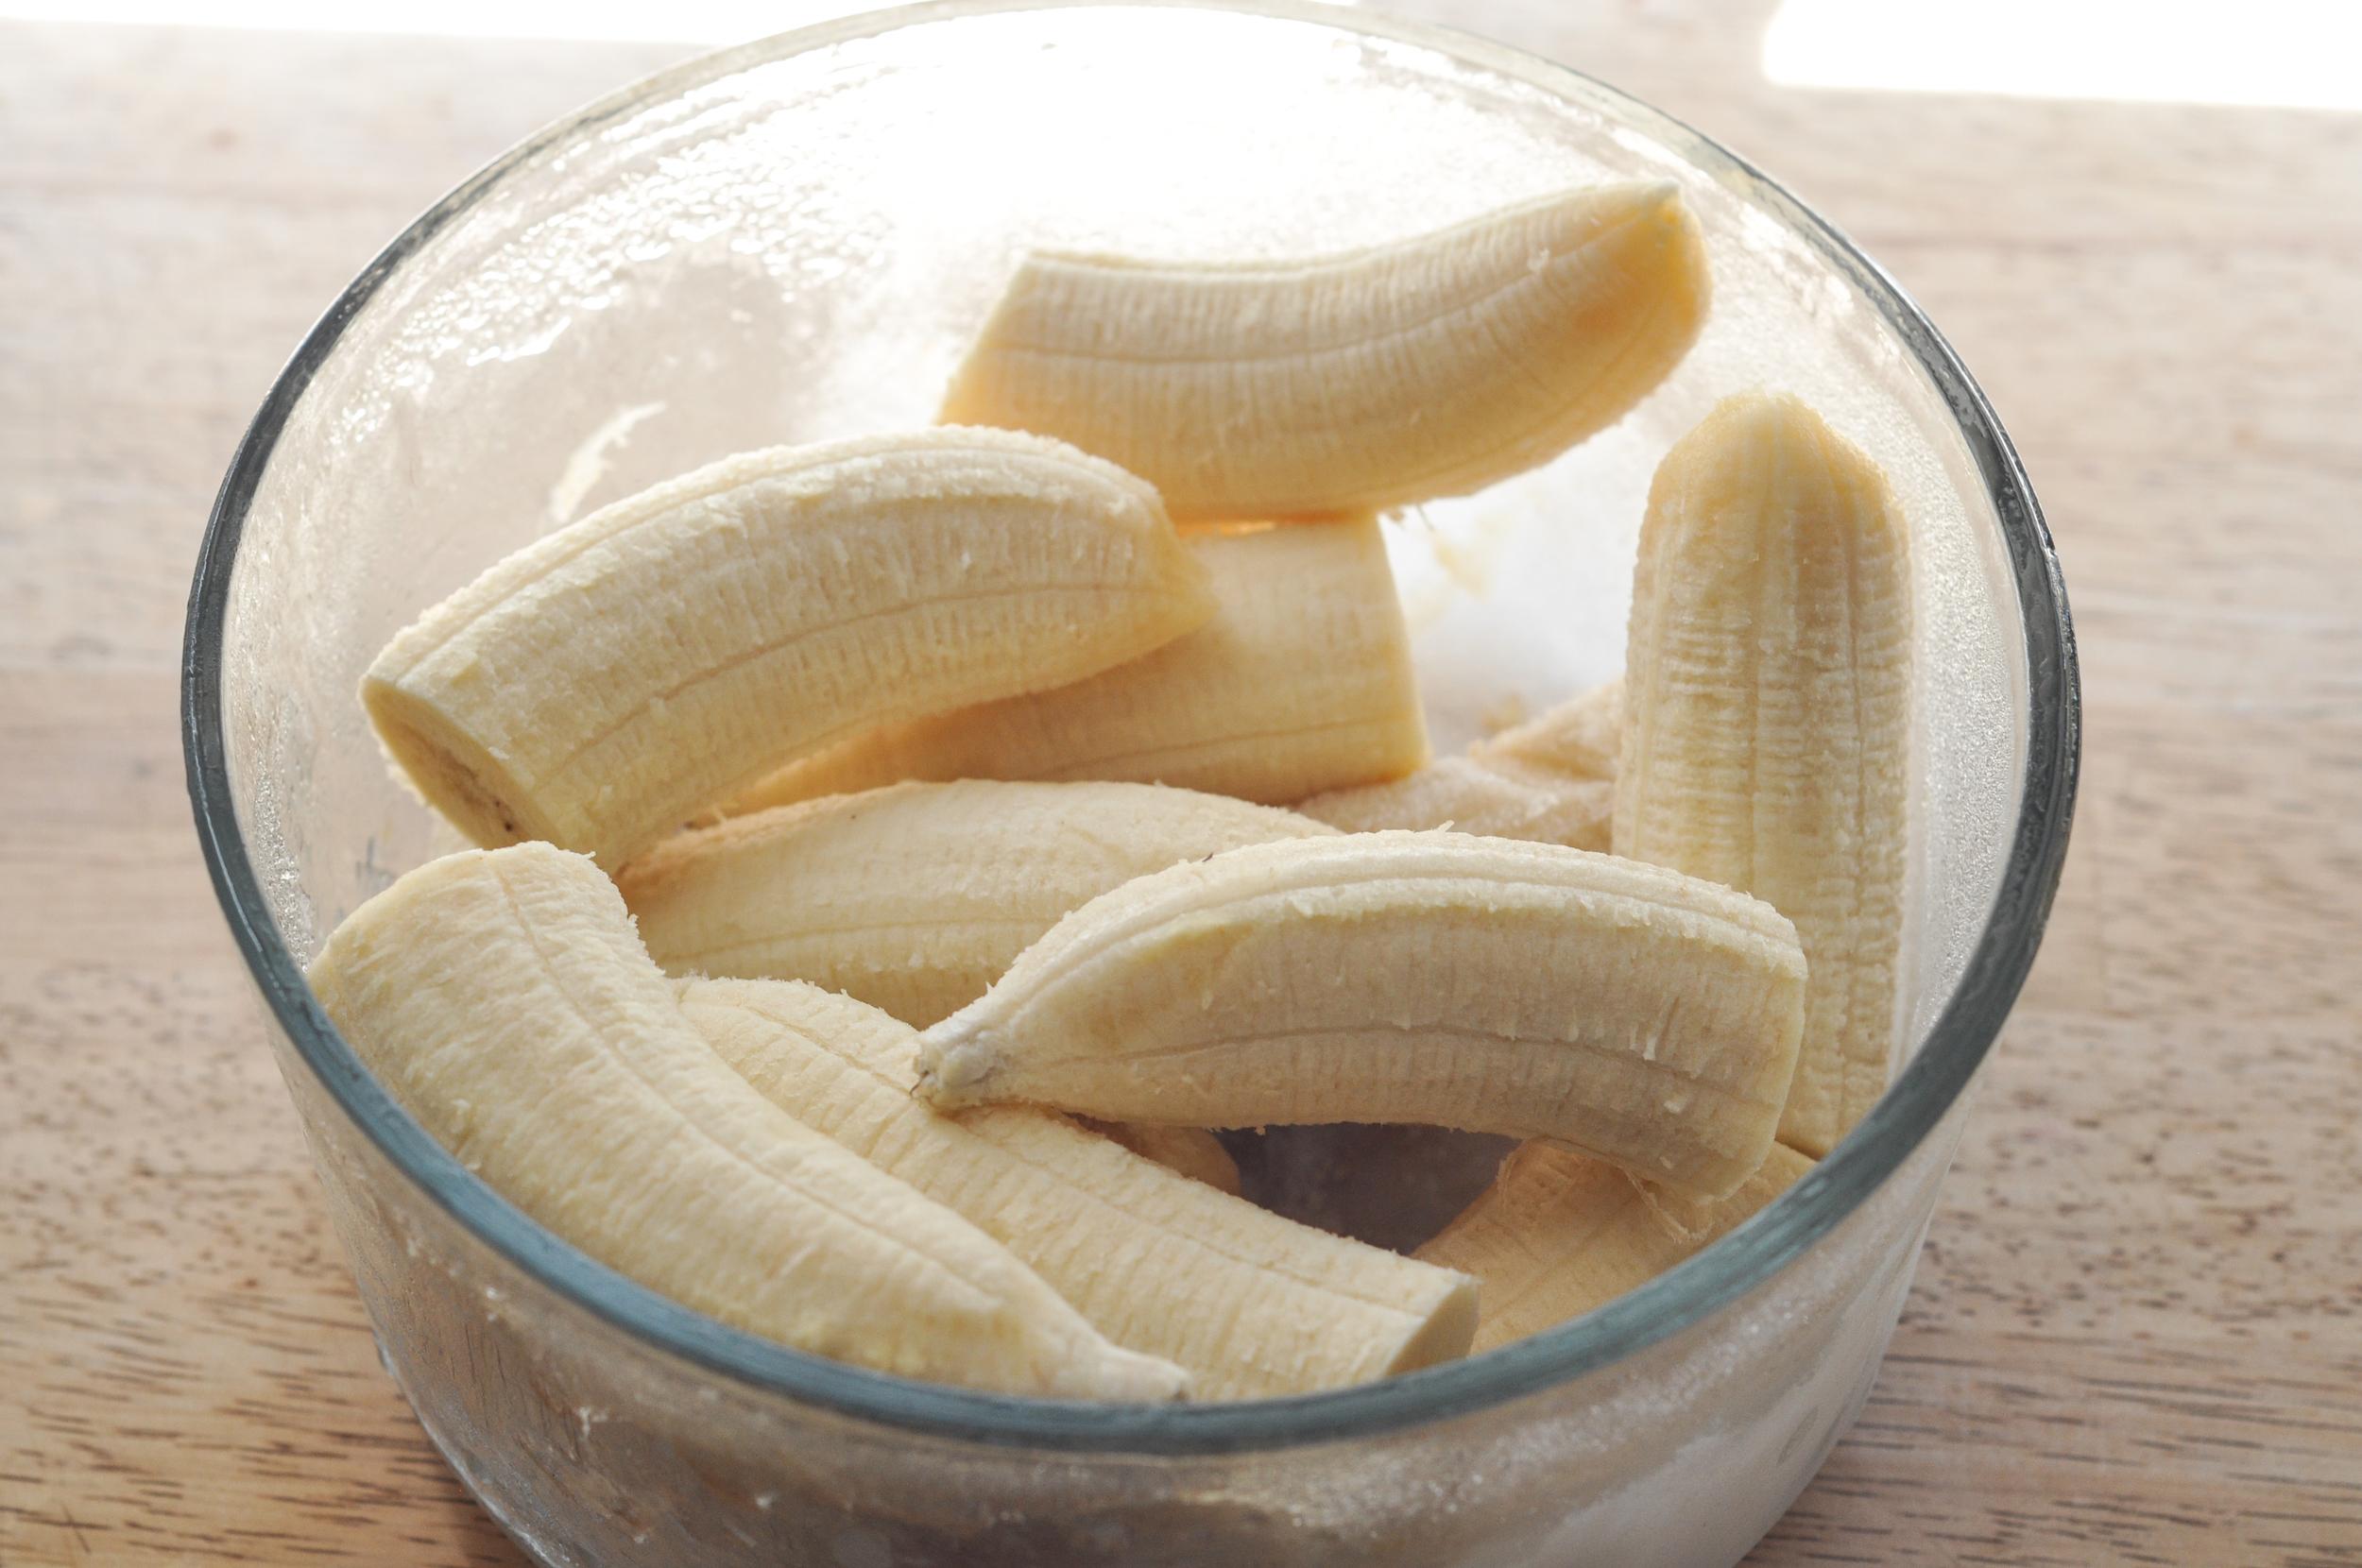 Freeandnative_Freeze_Your_Bananas_1.jpg